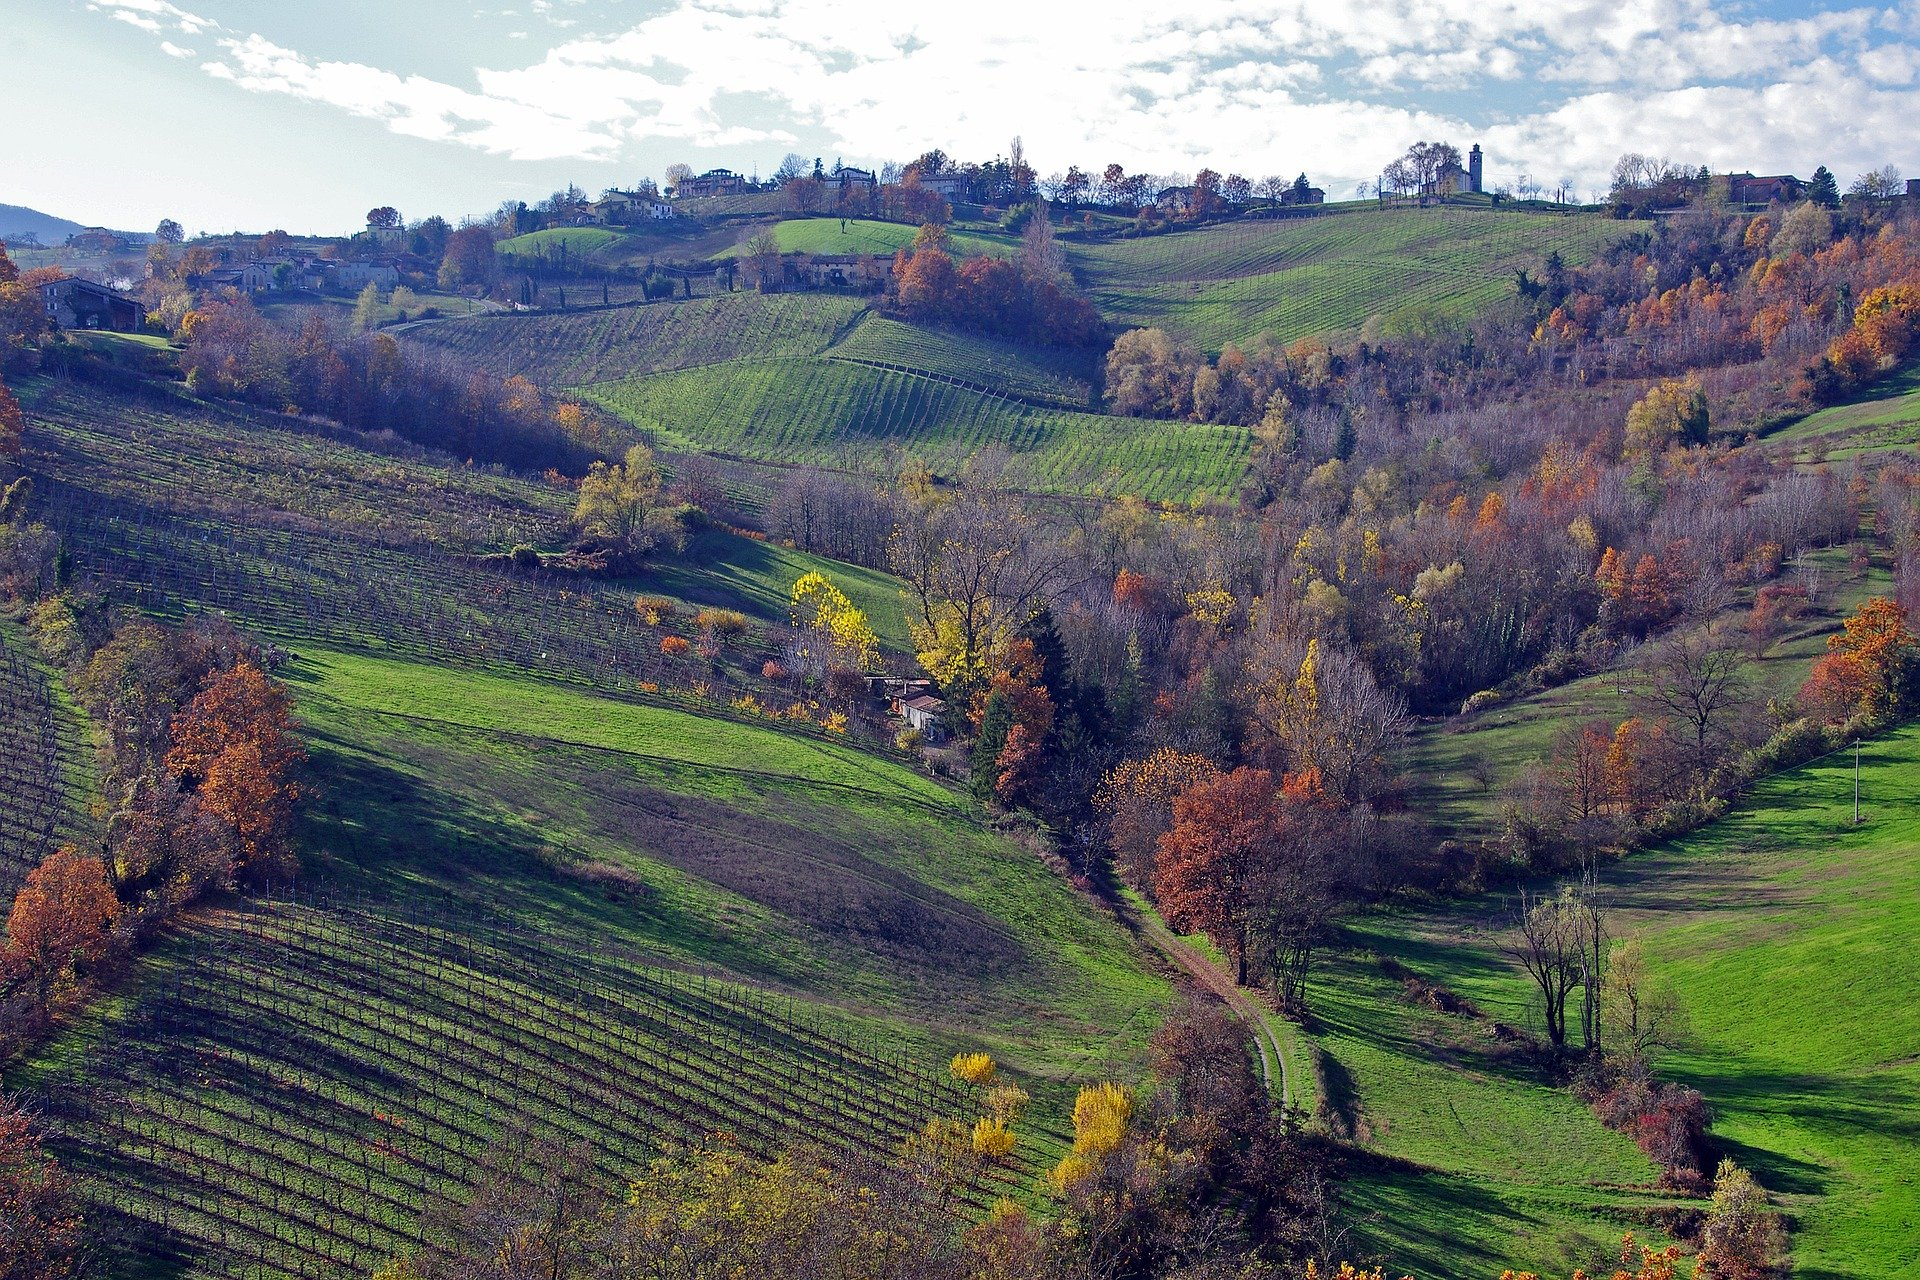 Landschaft in der Emilia-Romagna